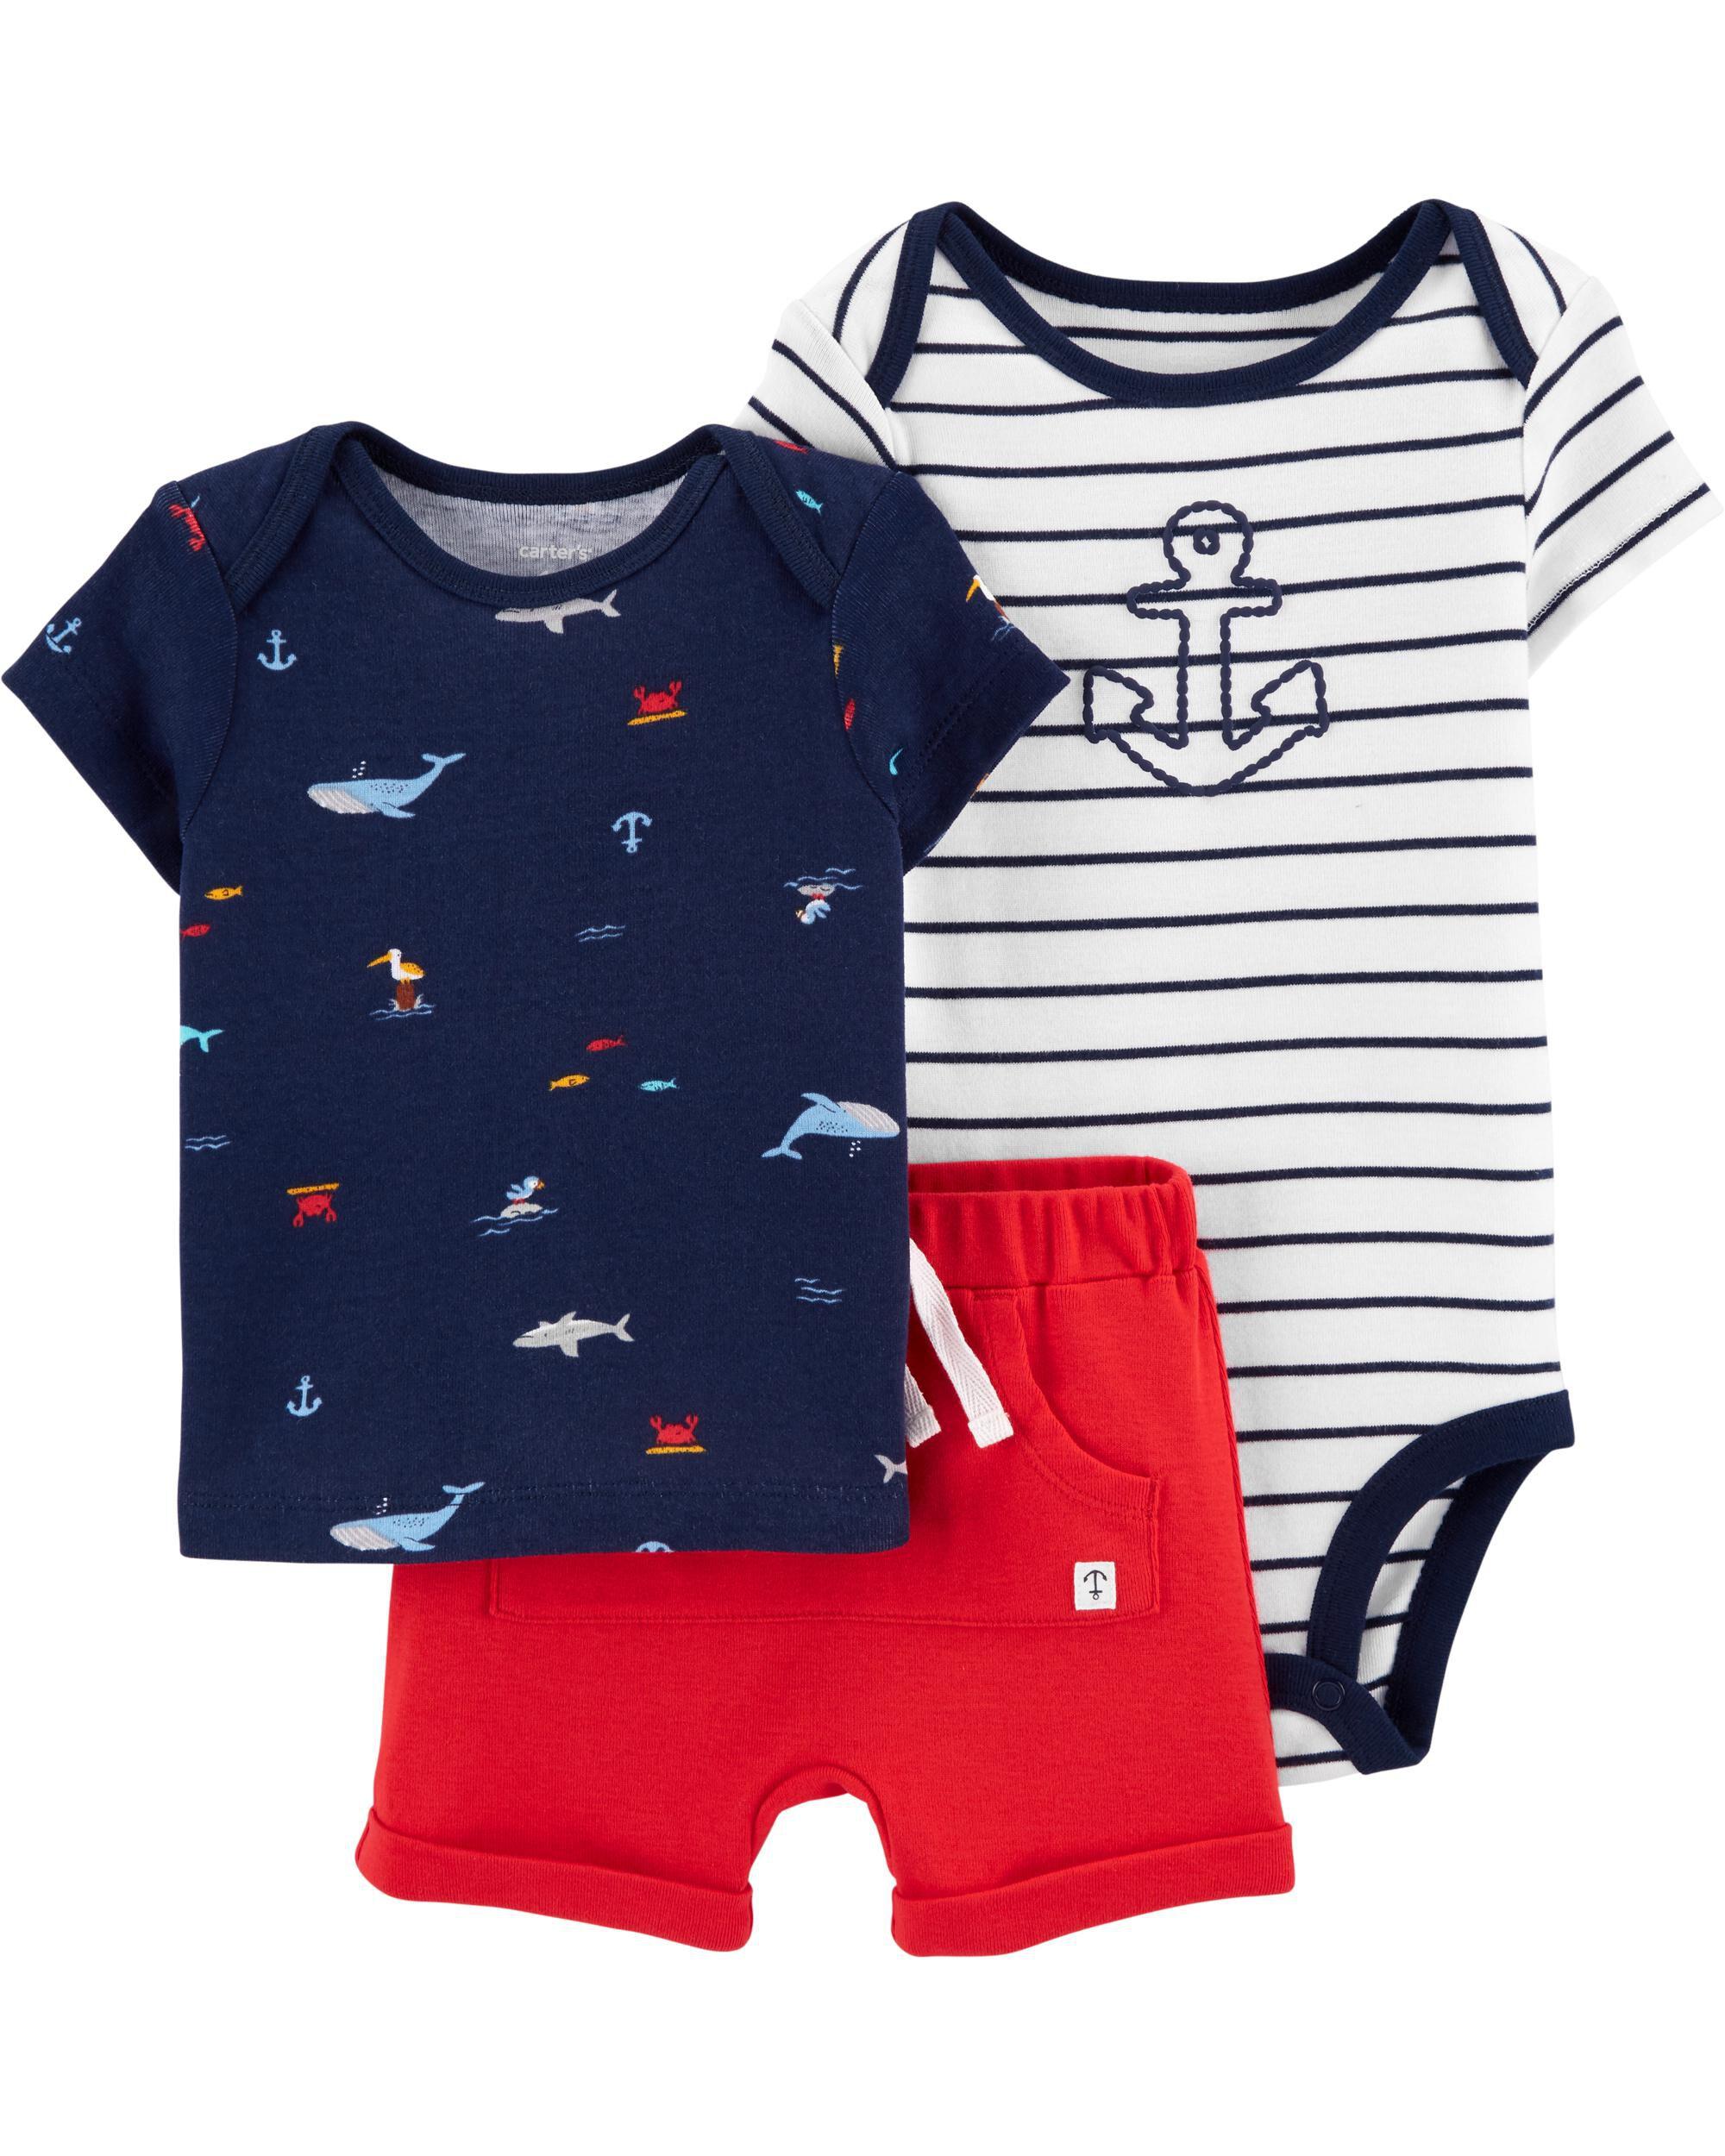 Carters Infants Baby Boys Fish Print 3 Piece Tank Shorts Pajama Set New